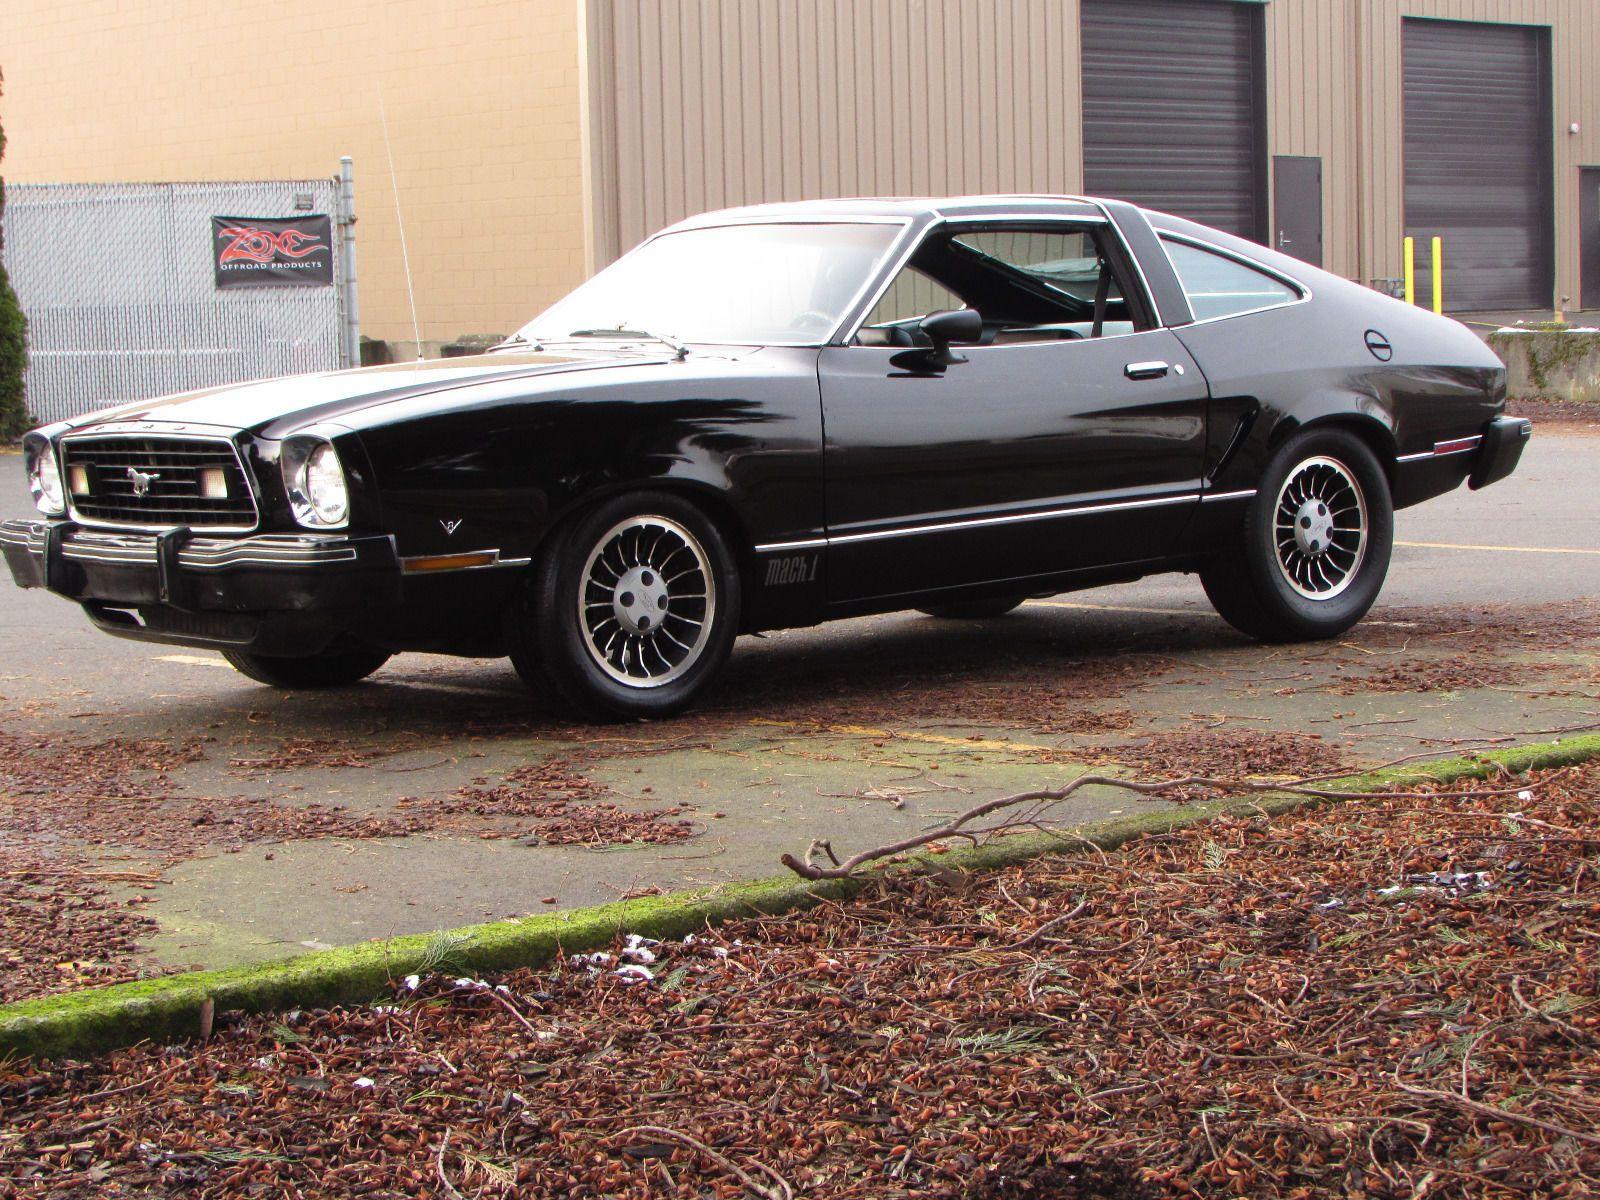 1977 Ford Mustang Mach 1 Ford Mustang Mustang Mach 1 Mustang Ii